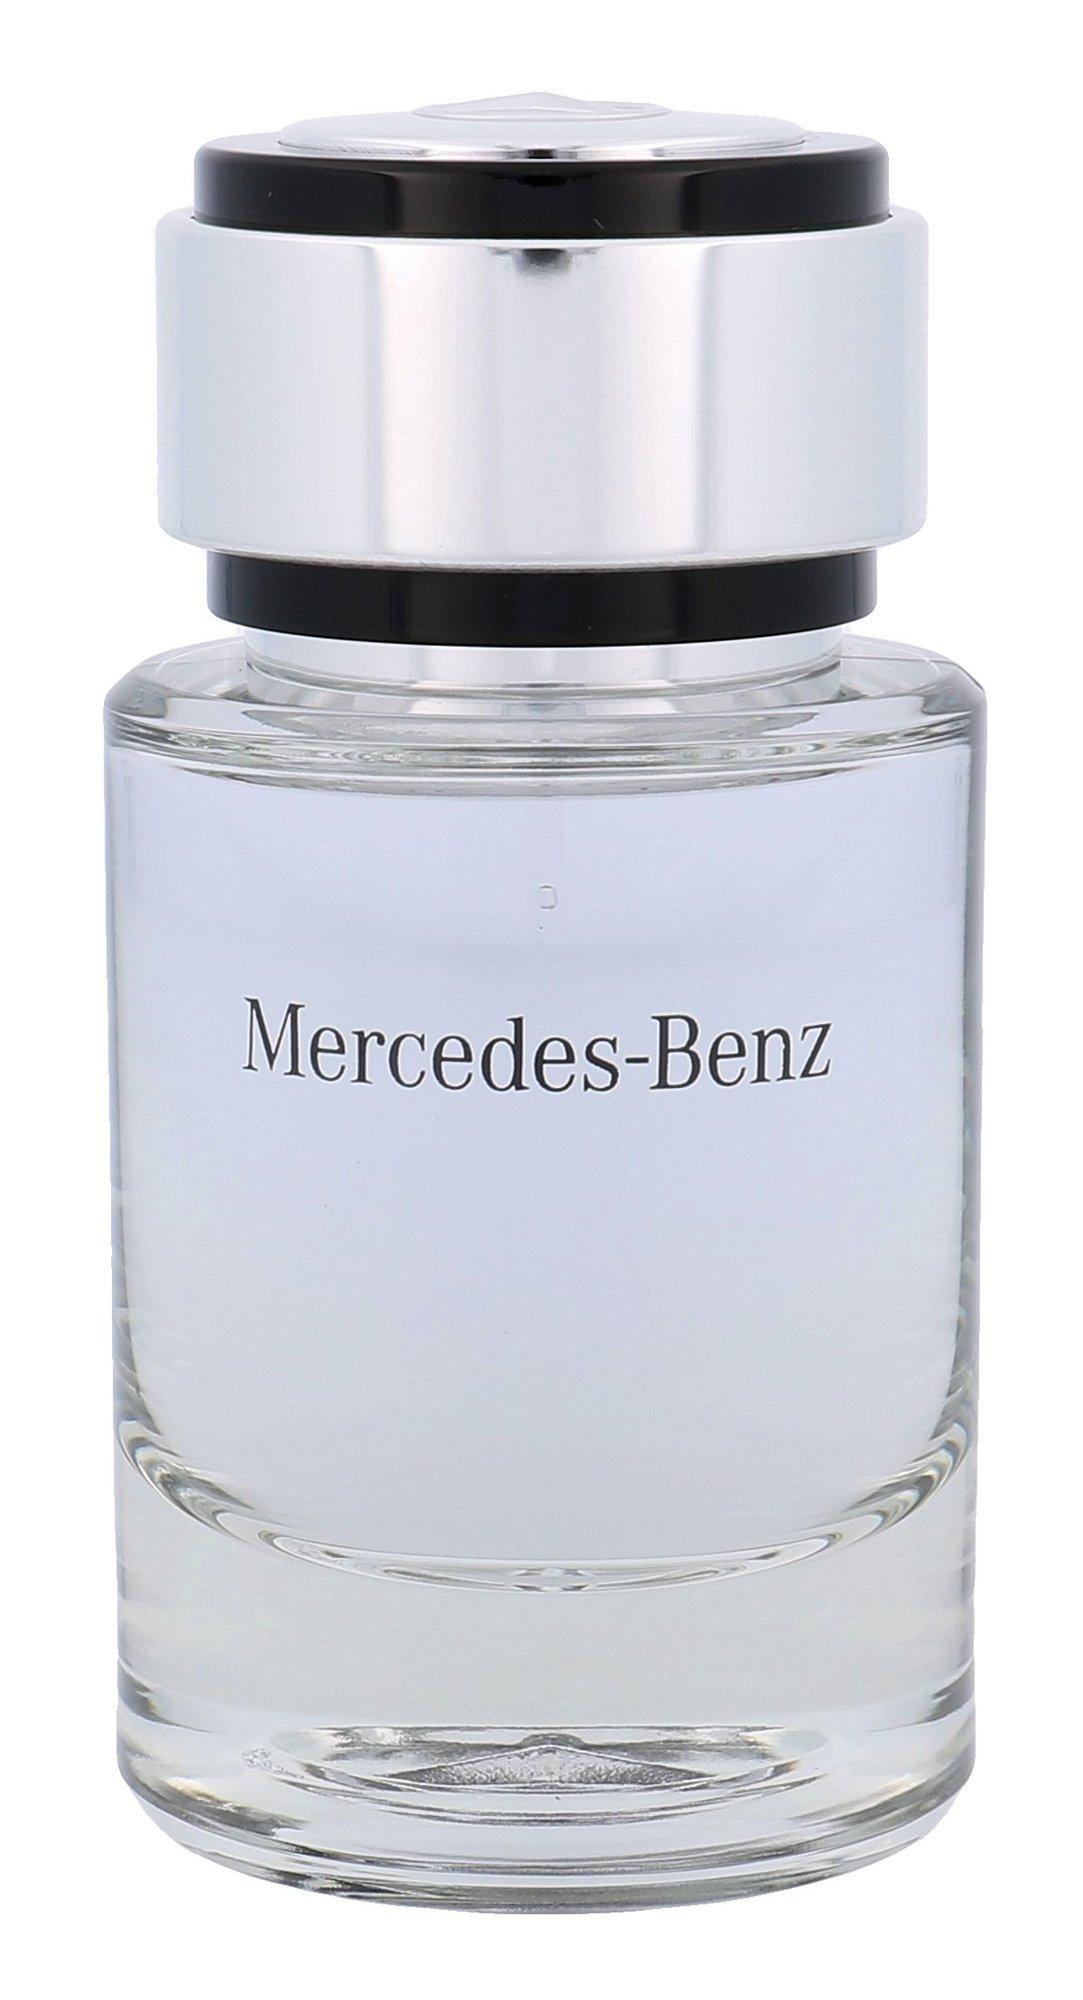 Mercedes-Benz Mercedes-Benz EDT 75ml